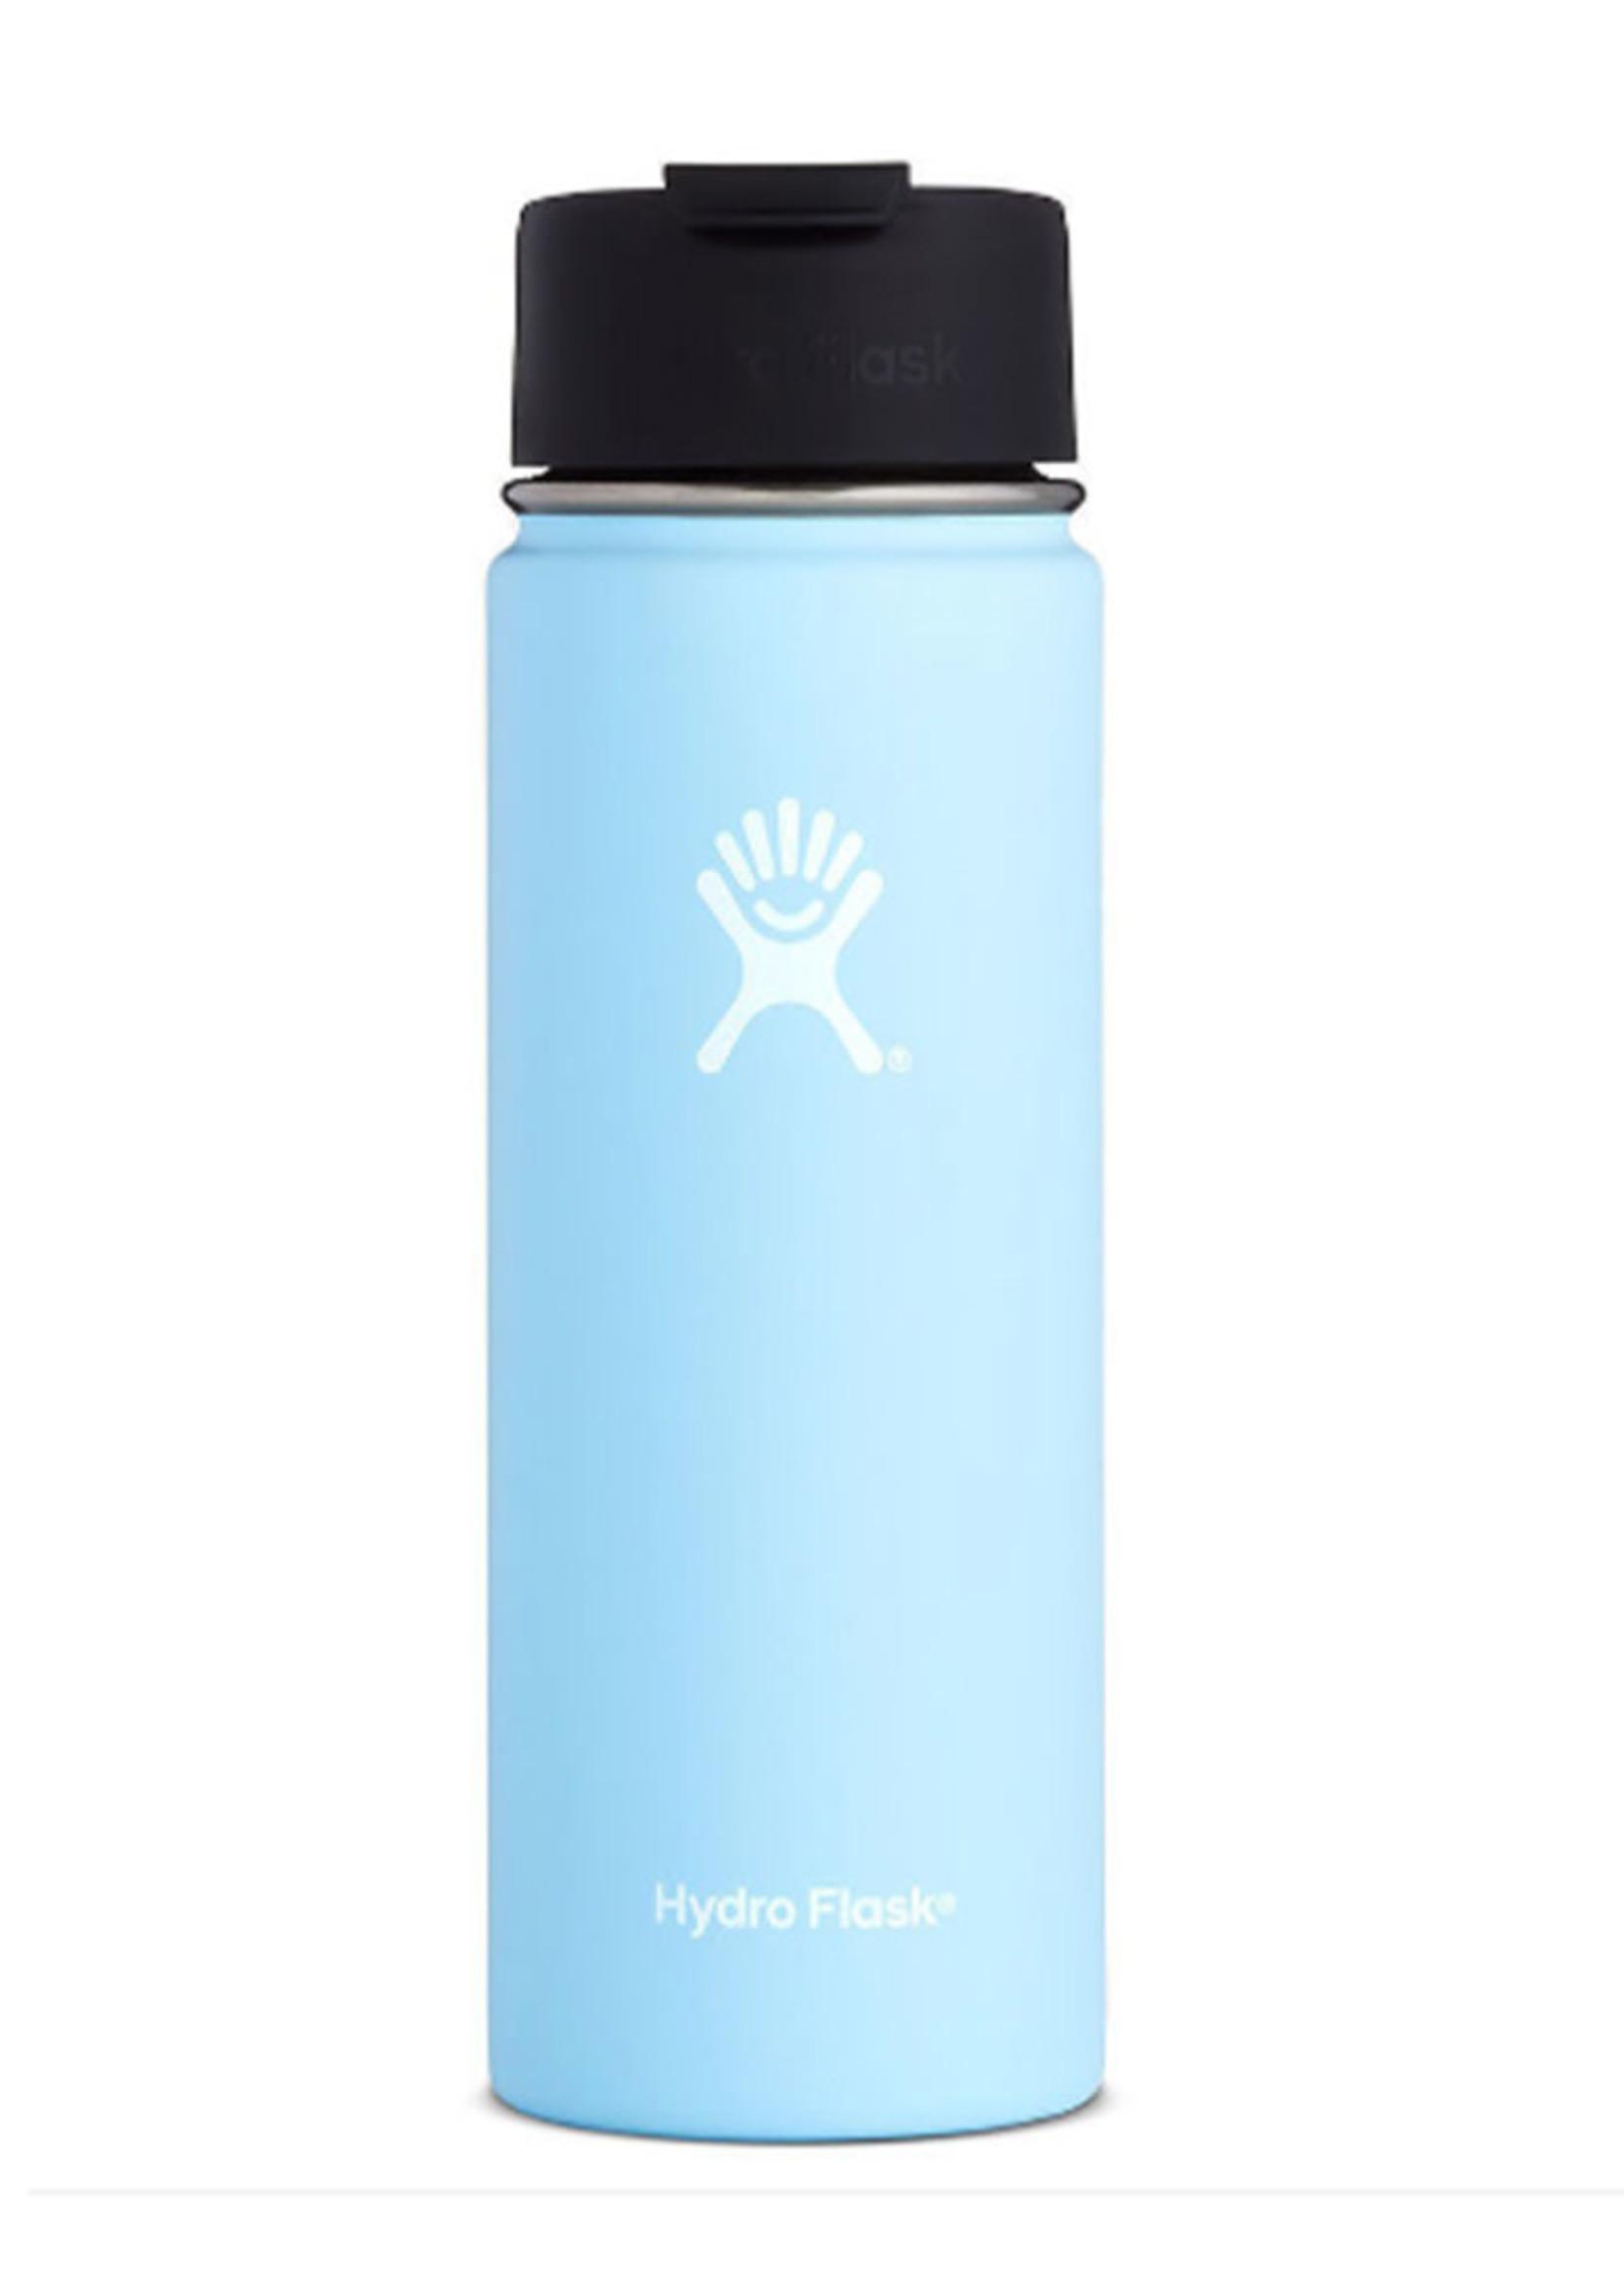 Hydro Flask Hydro Flask 20 oz Wide Mouth w/Flip